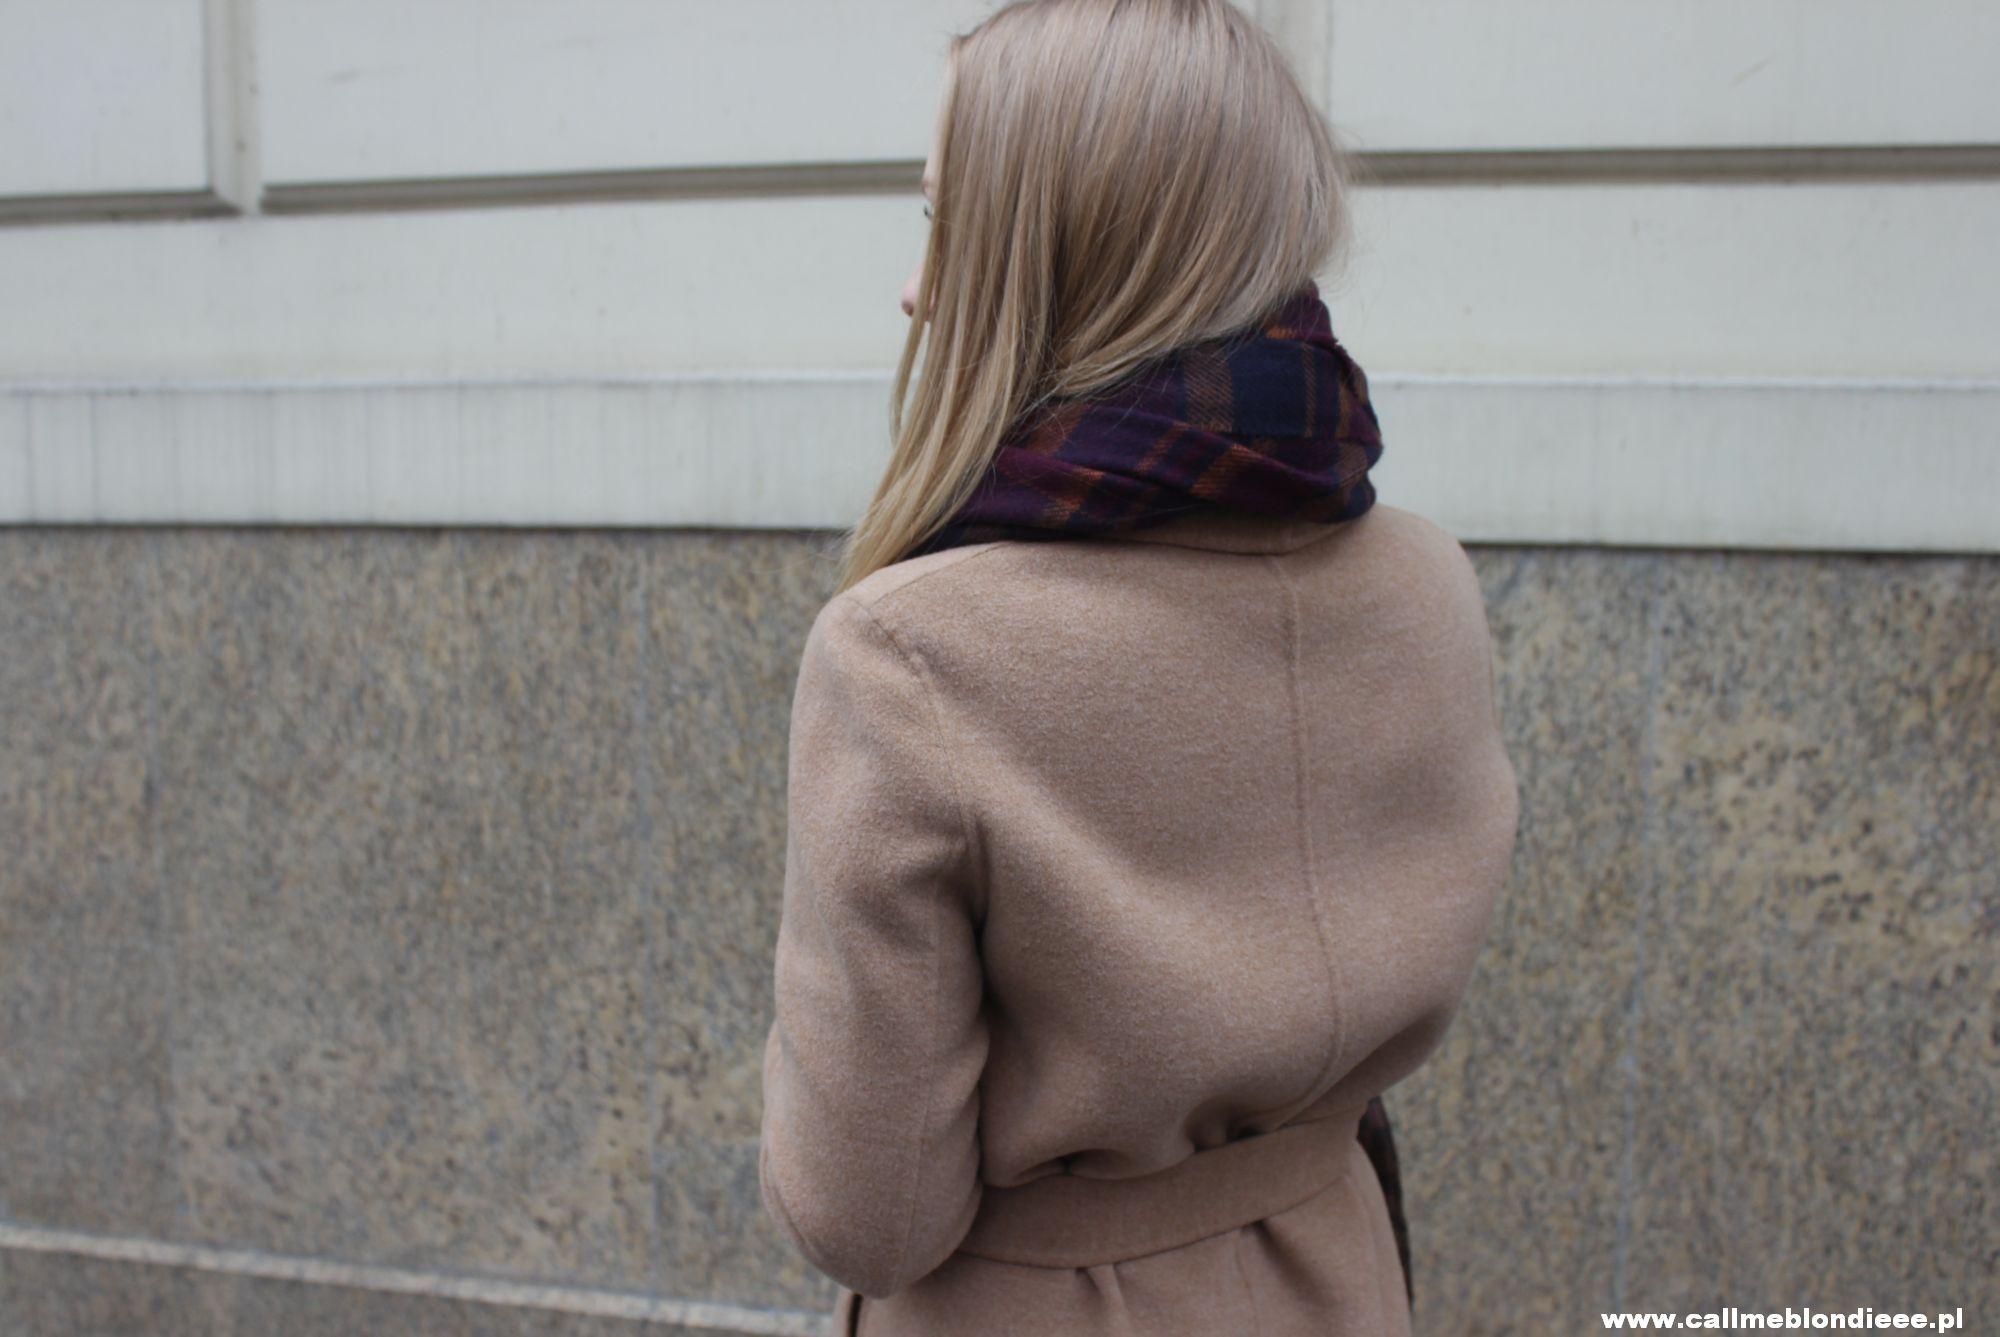 OOTD Camel Coat & Burgundy Jeans 2